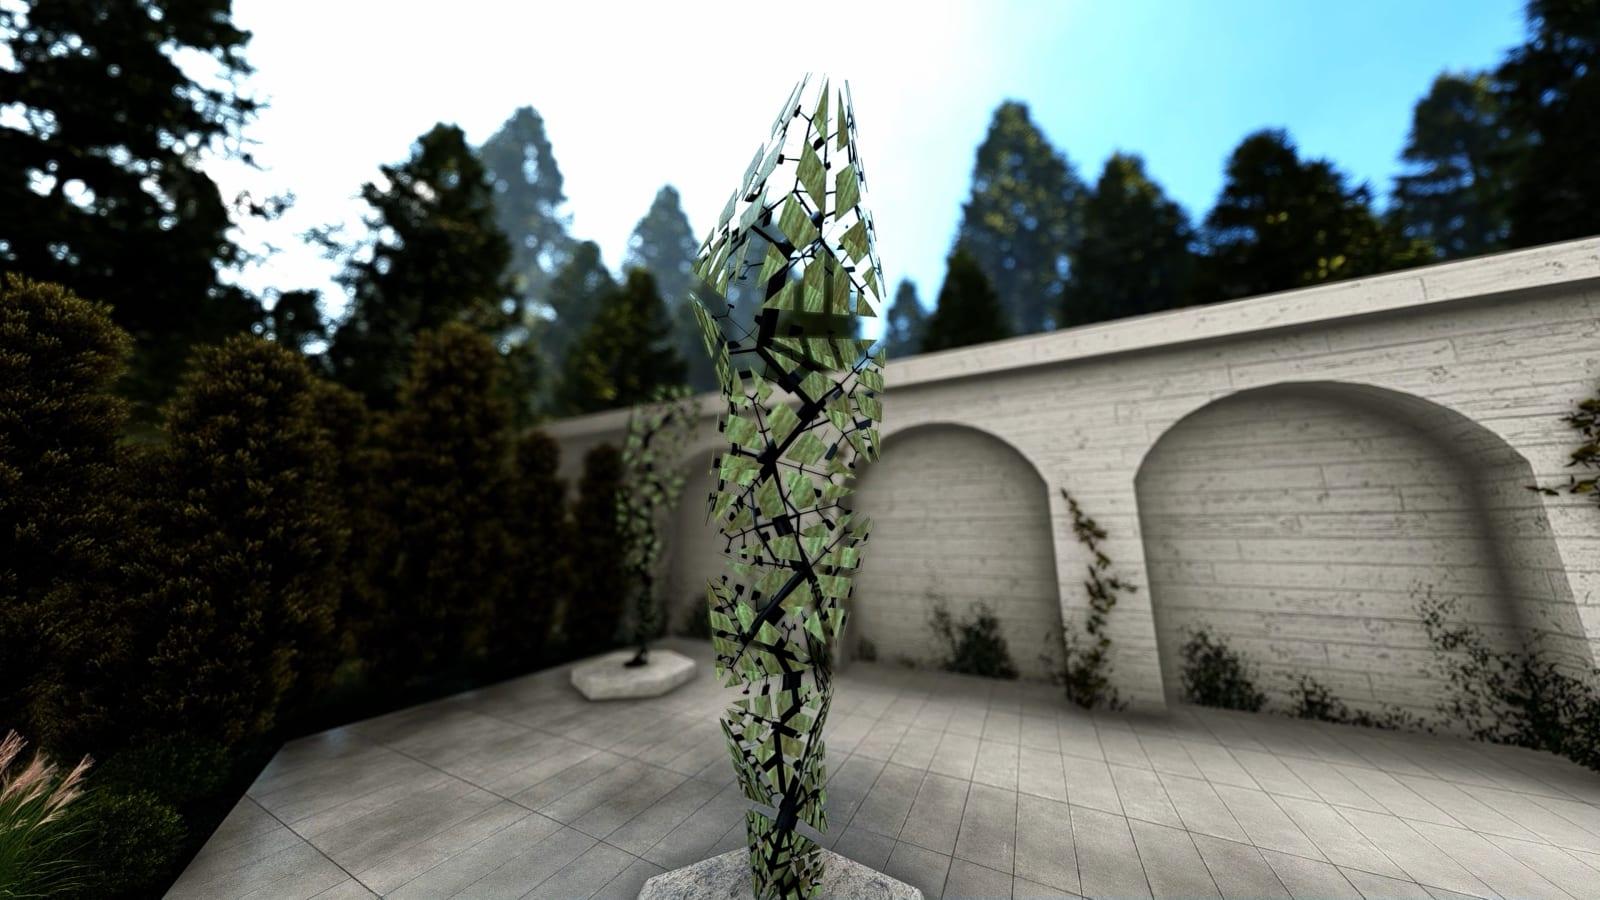 CONRAD SHAWCROSS The Fracture - Four Seasons, Summer, 2020 400 cm tall